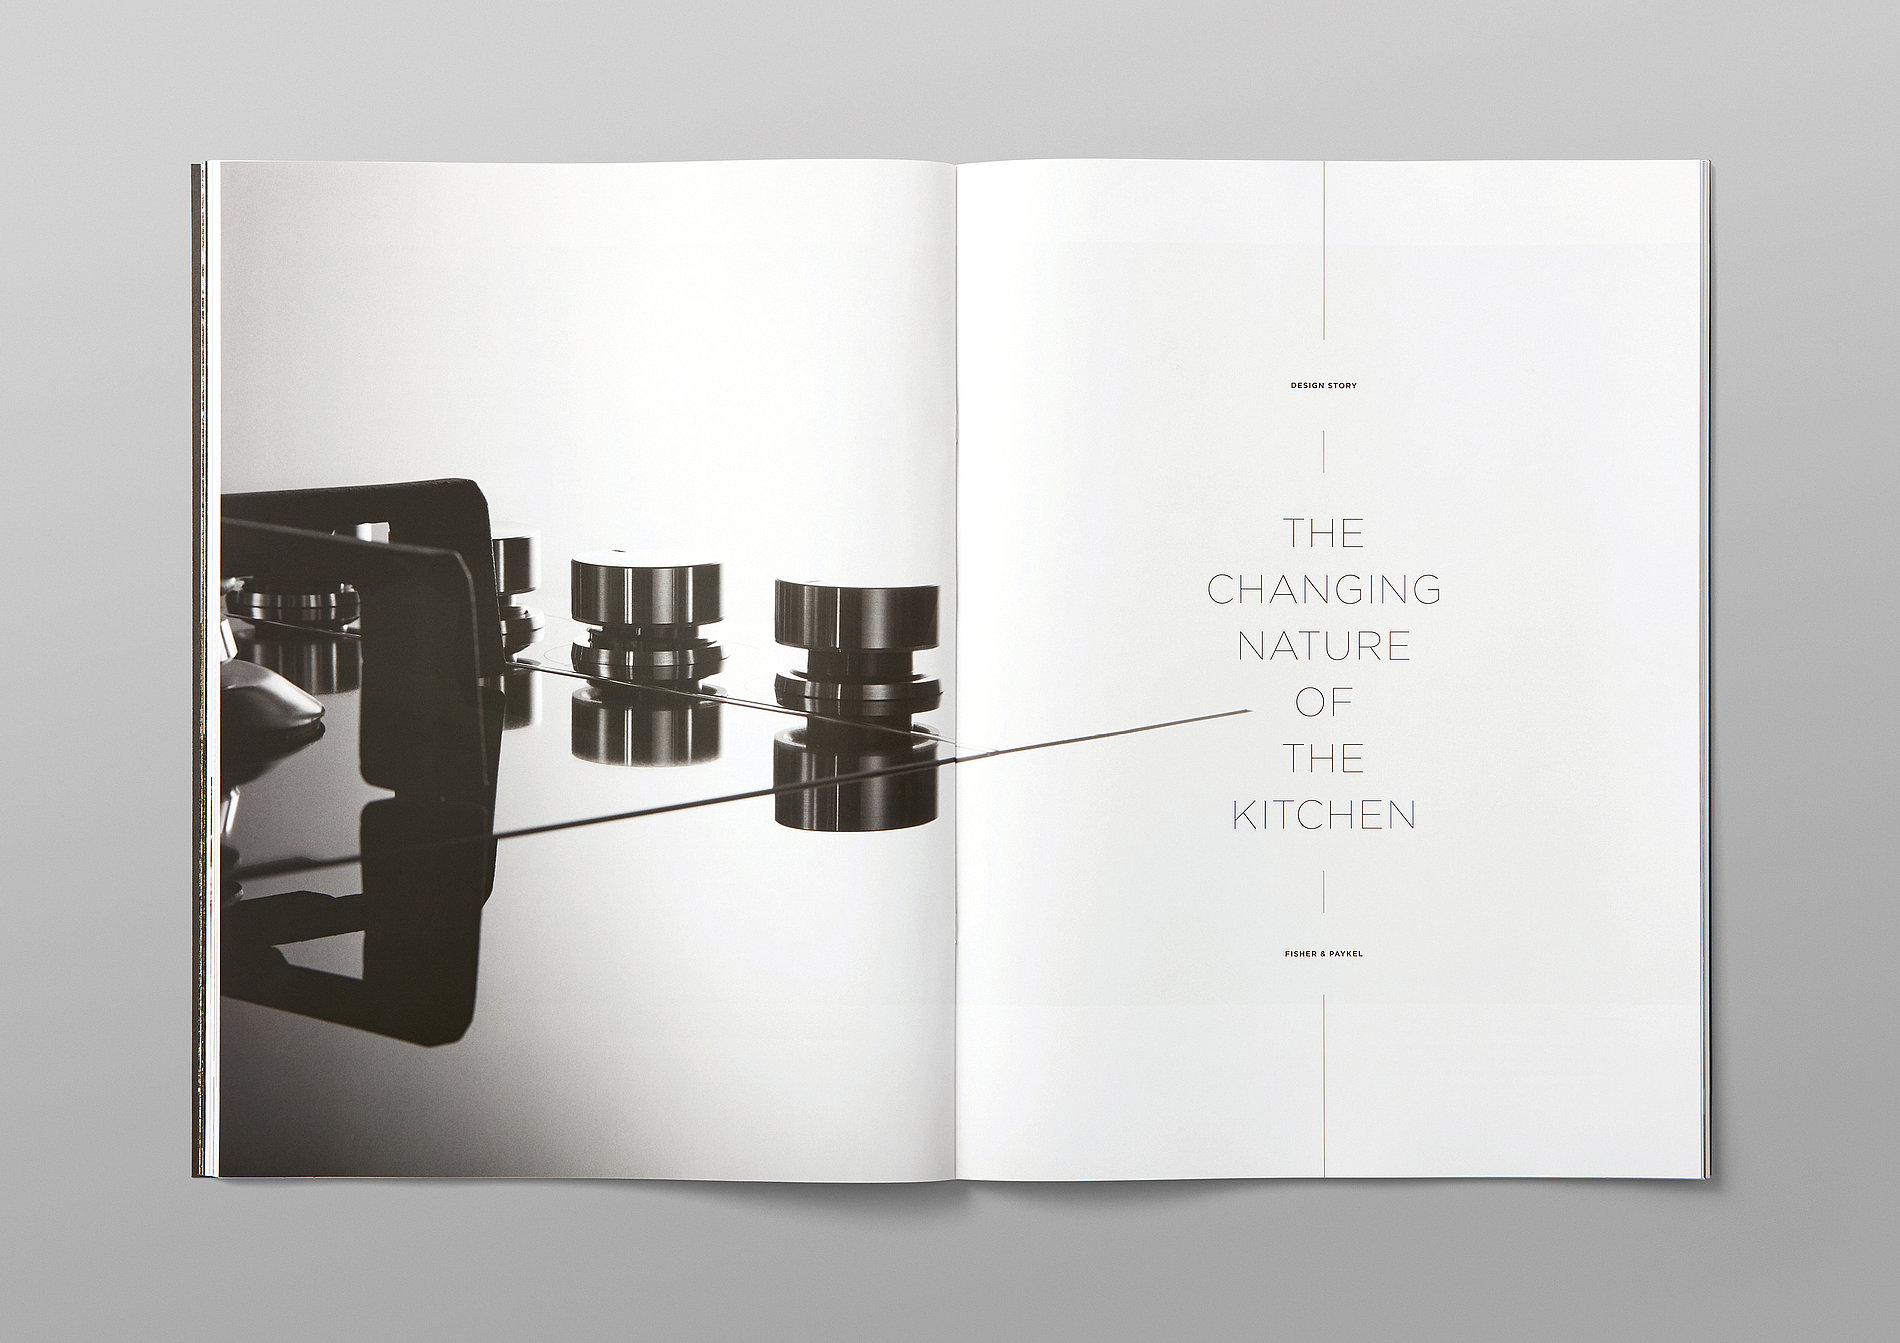 Fisher & Paykel – EuroCucina Catalogue | Red Dot Design Award